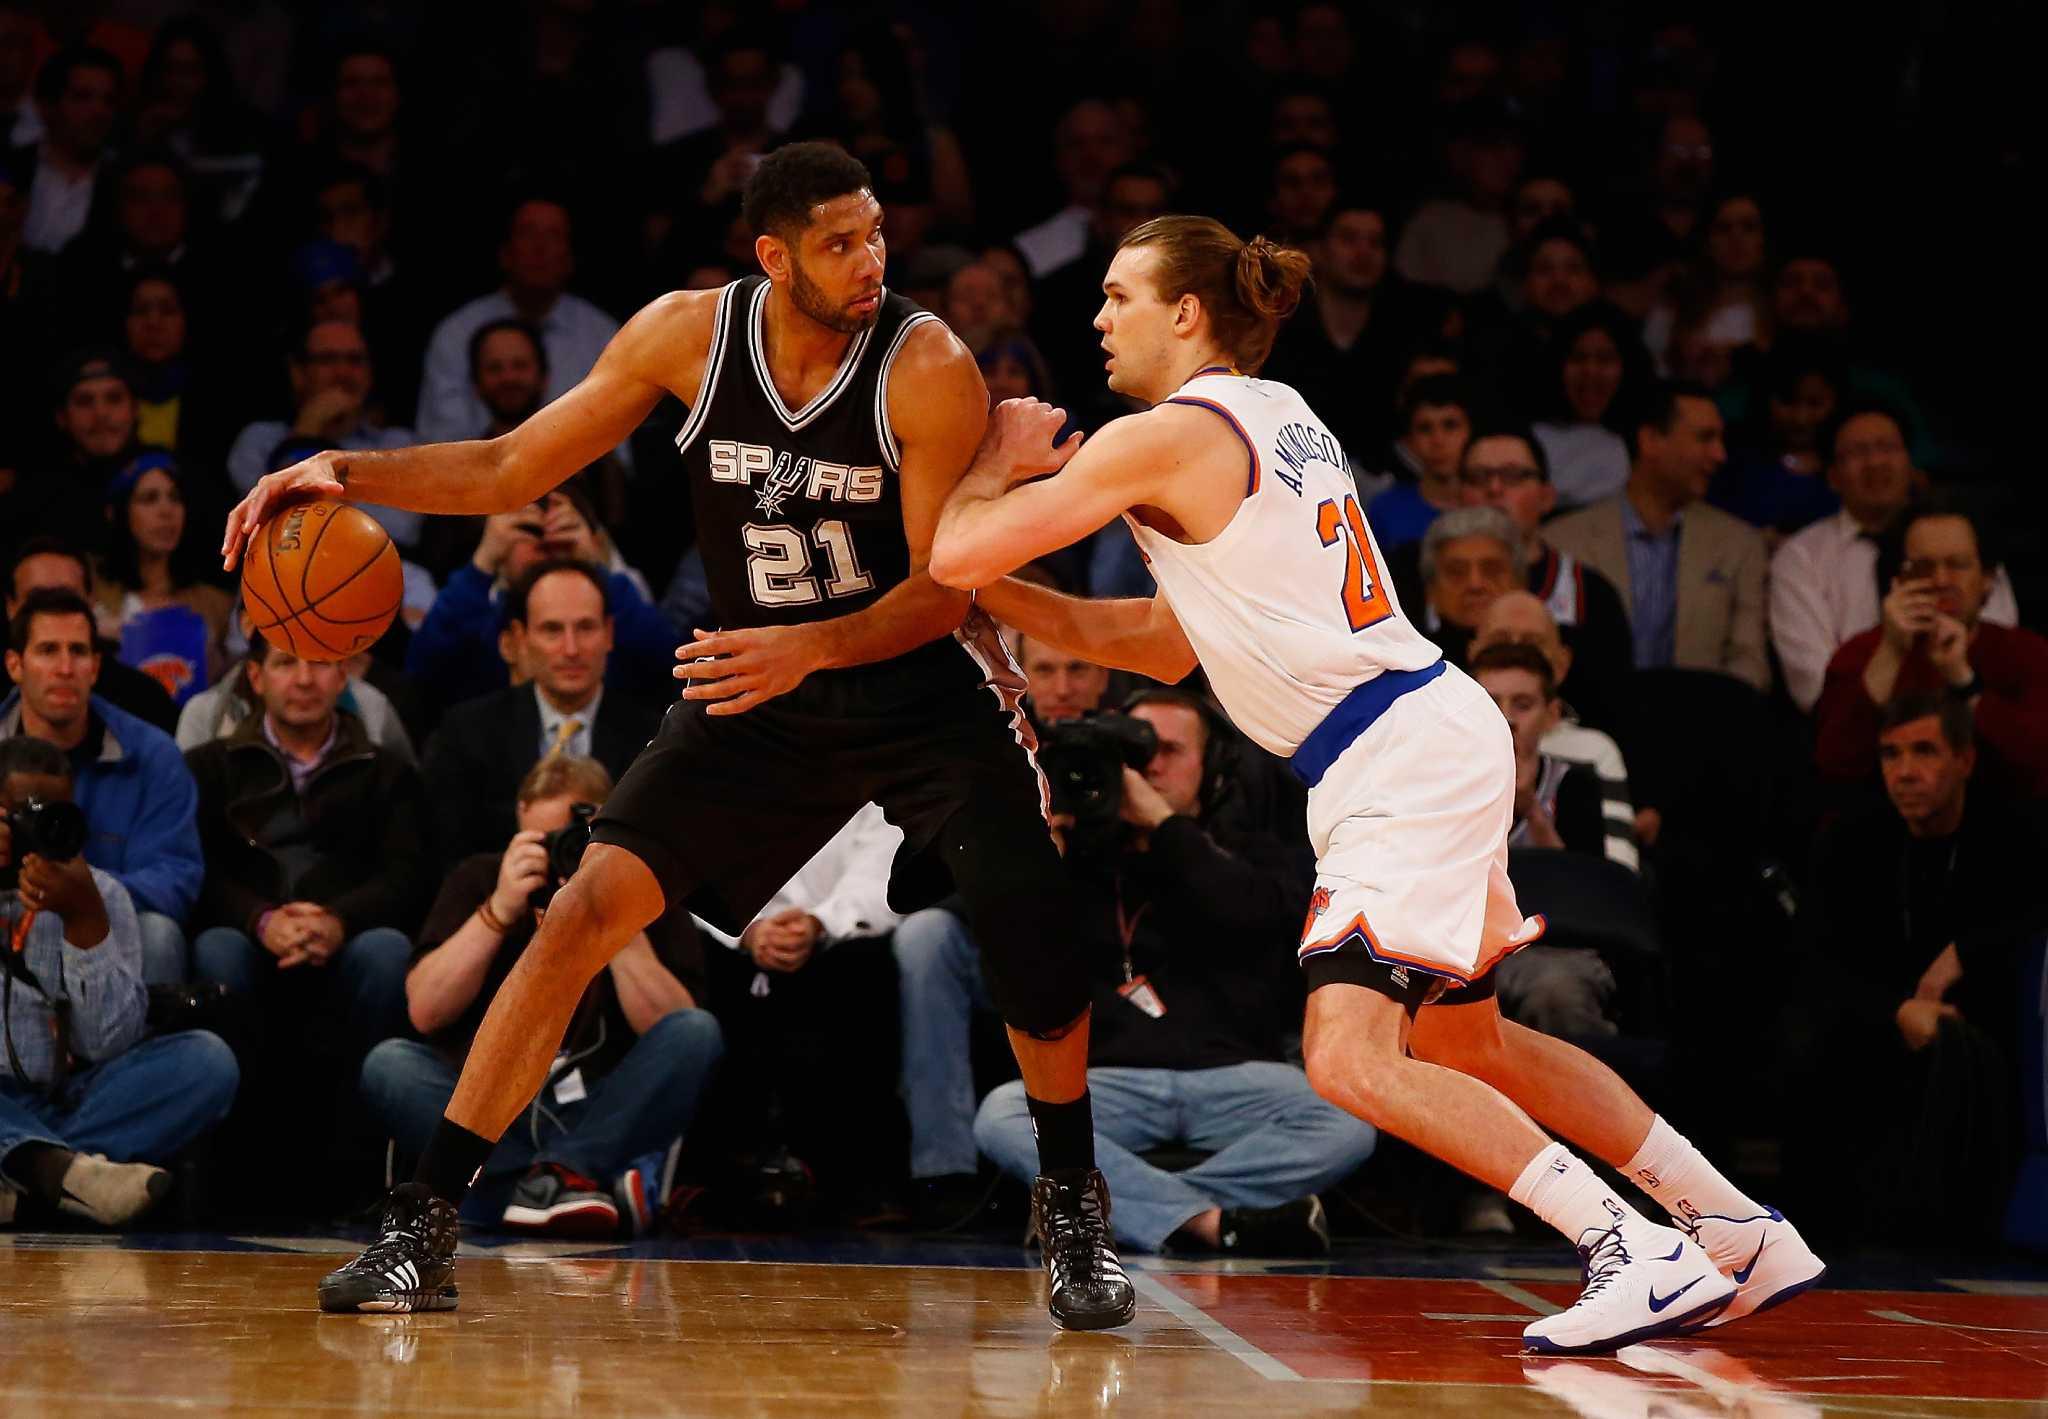 Spurs Vs Knicks Detail: San Antonio Spurs Vs. New York Knicks Live Blog